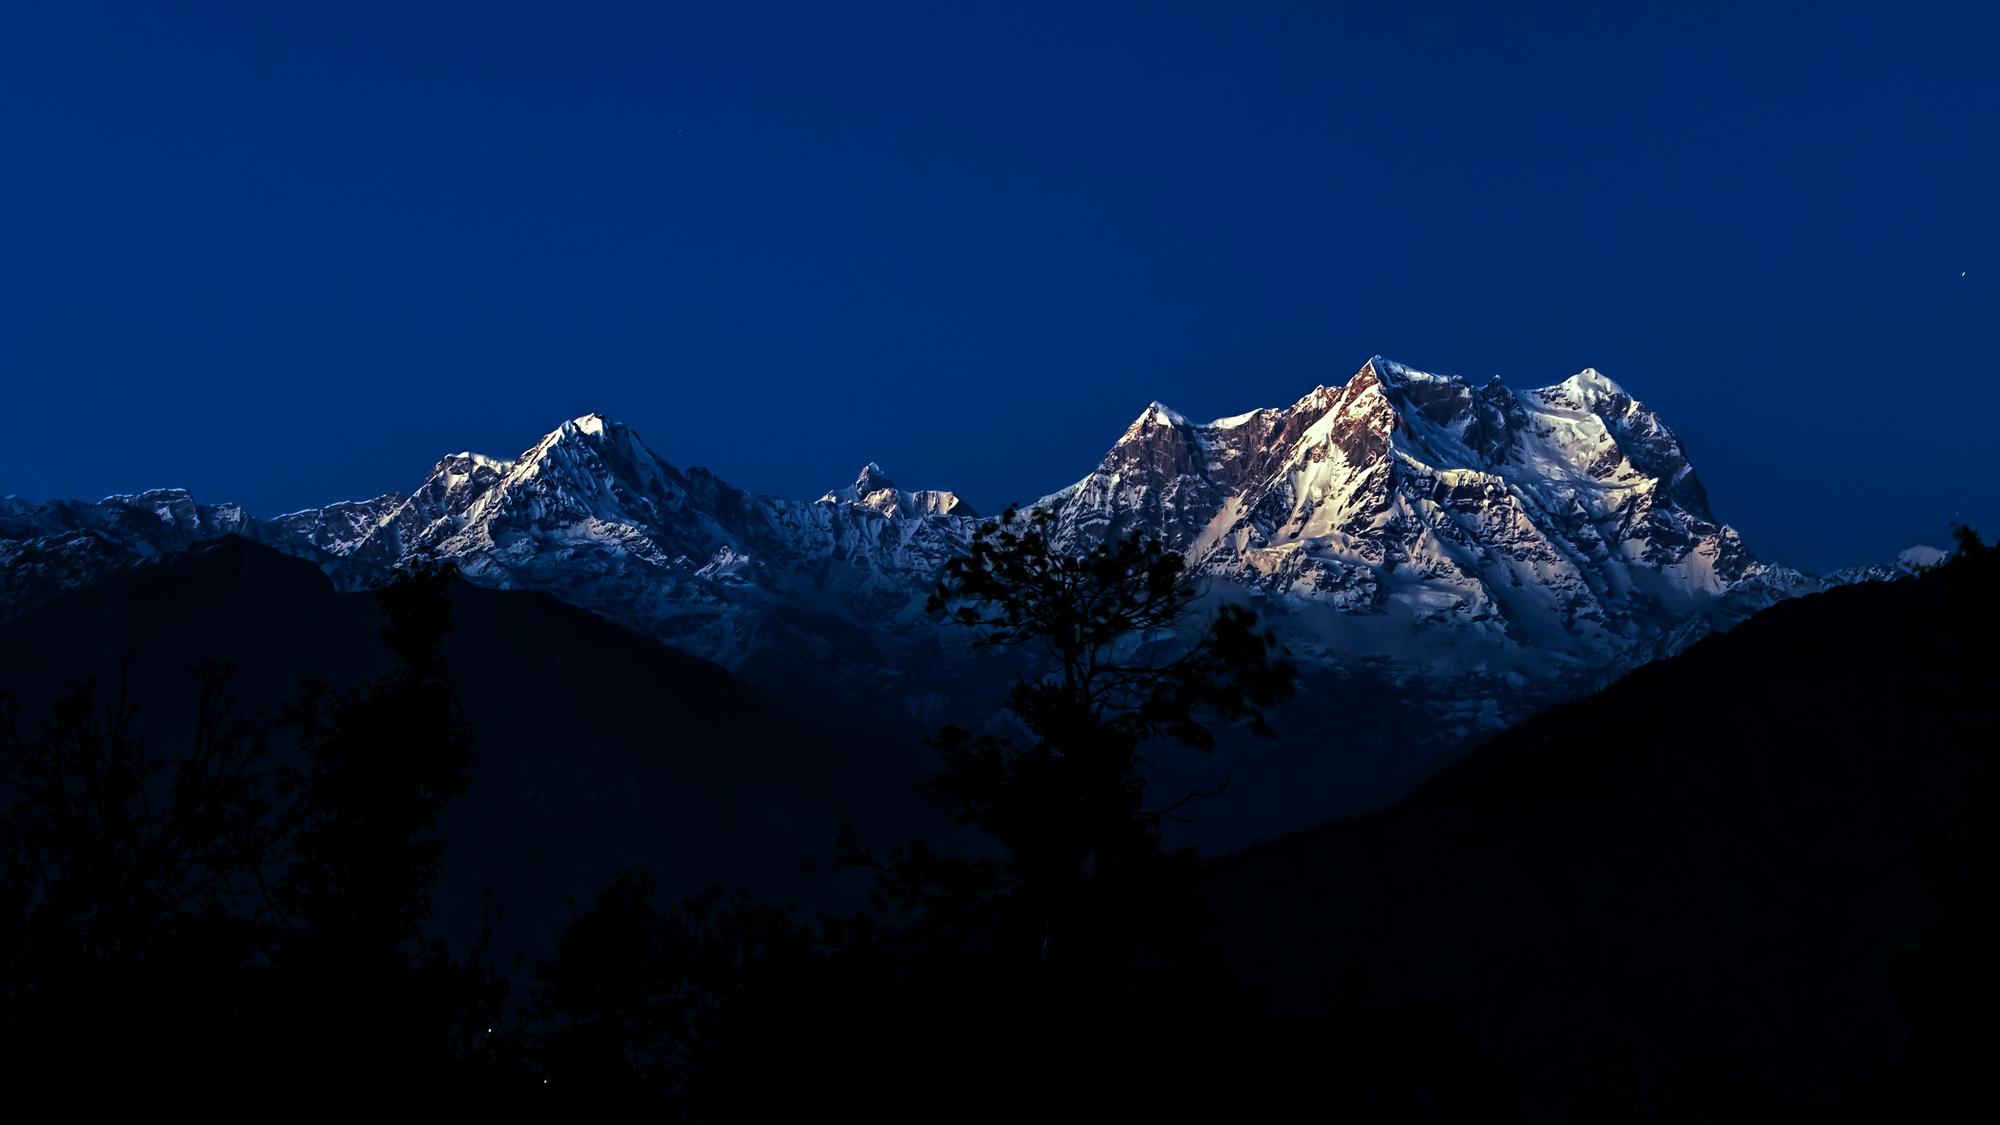 A Moonlight View of Chowkhamba Peak, Uttarakhand, India.